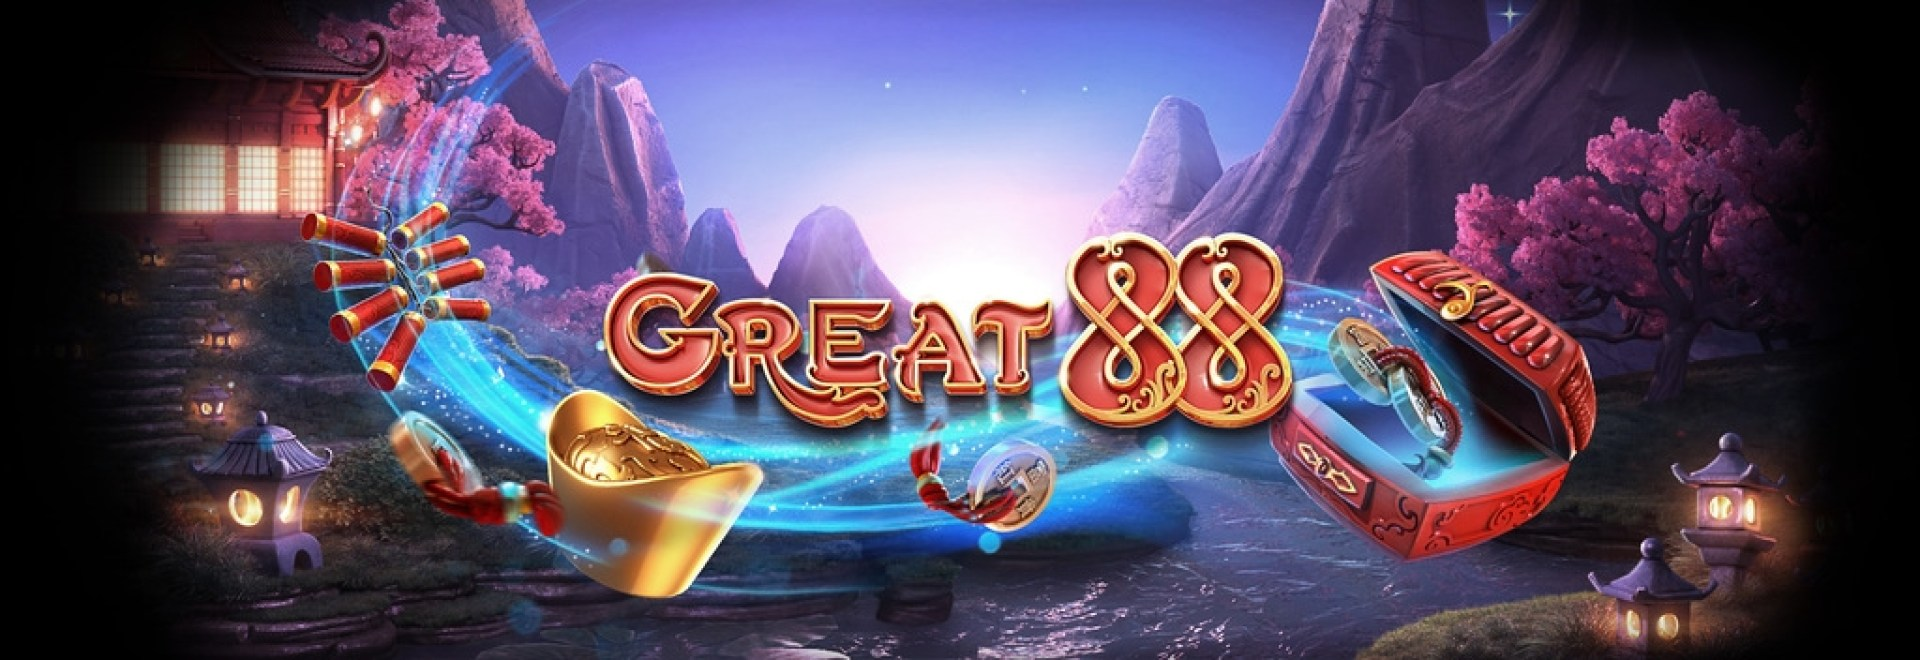 Betsoft Great 88; Black Diamond Casino; Box 24 Casino; Spartan Slots